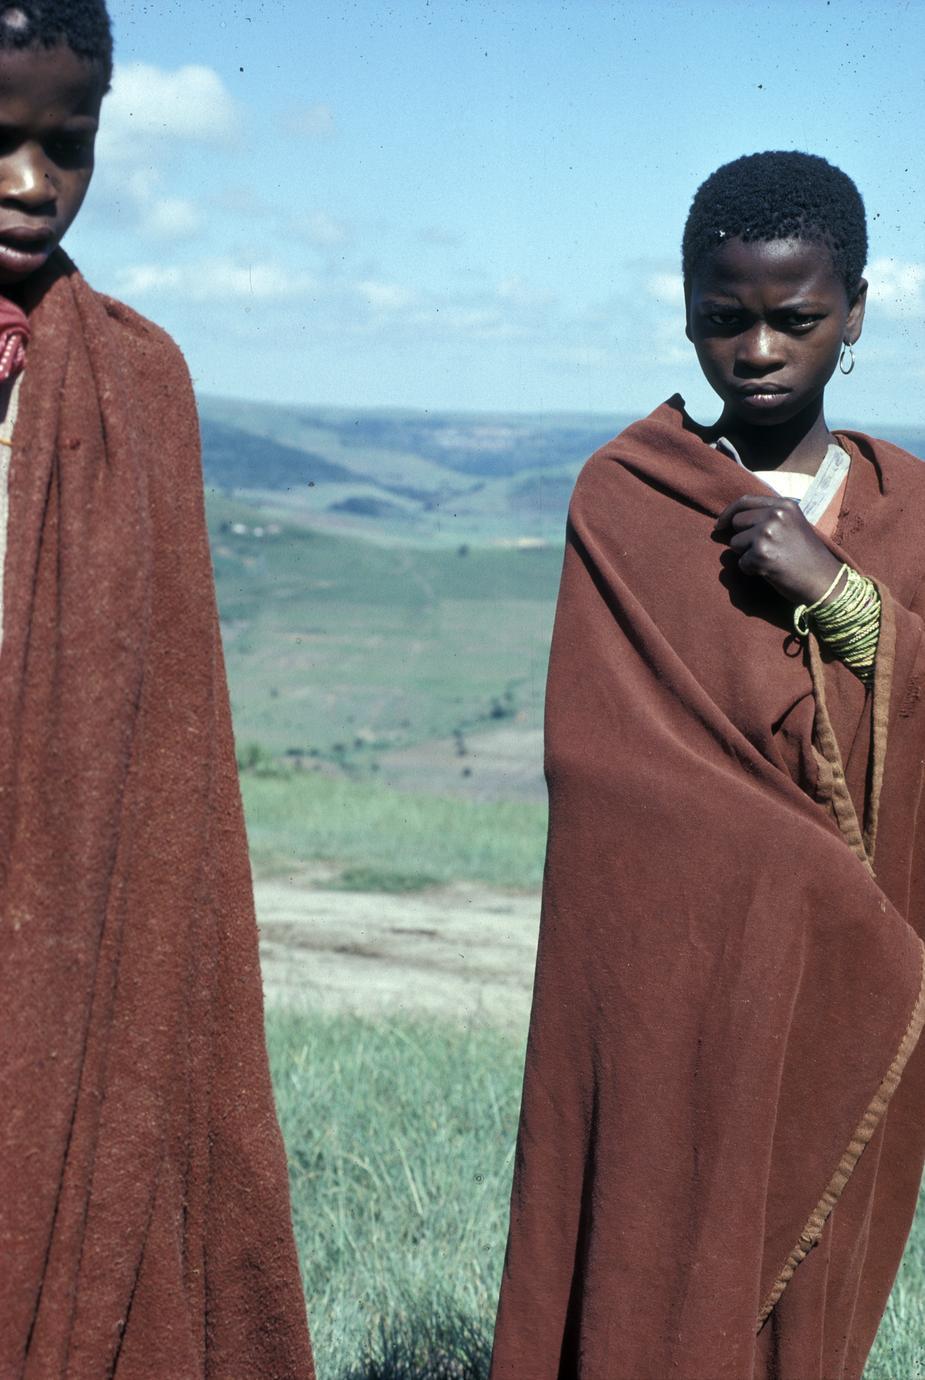 Xhosa Transkei children